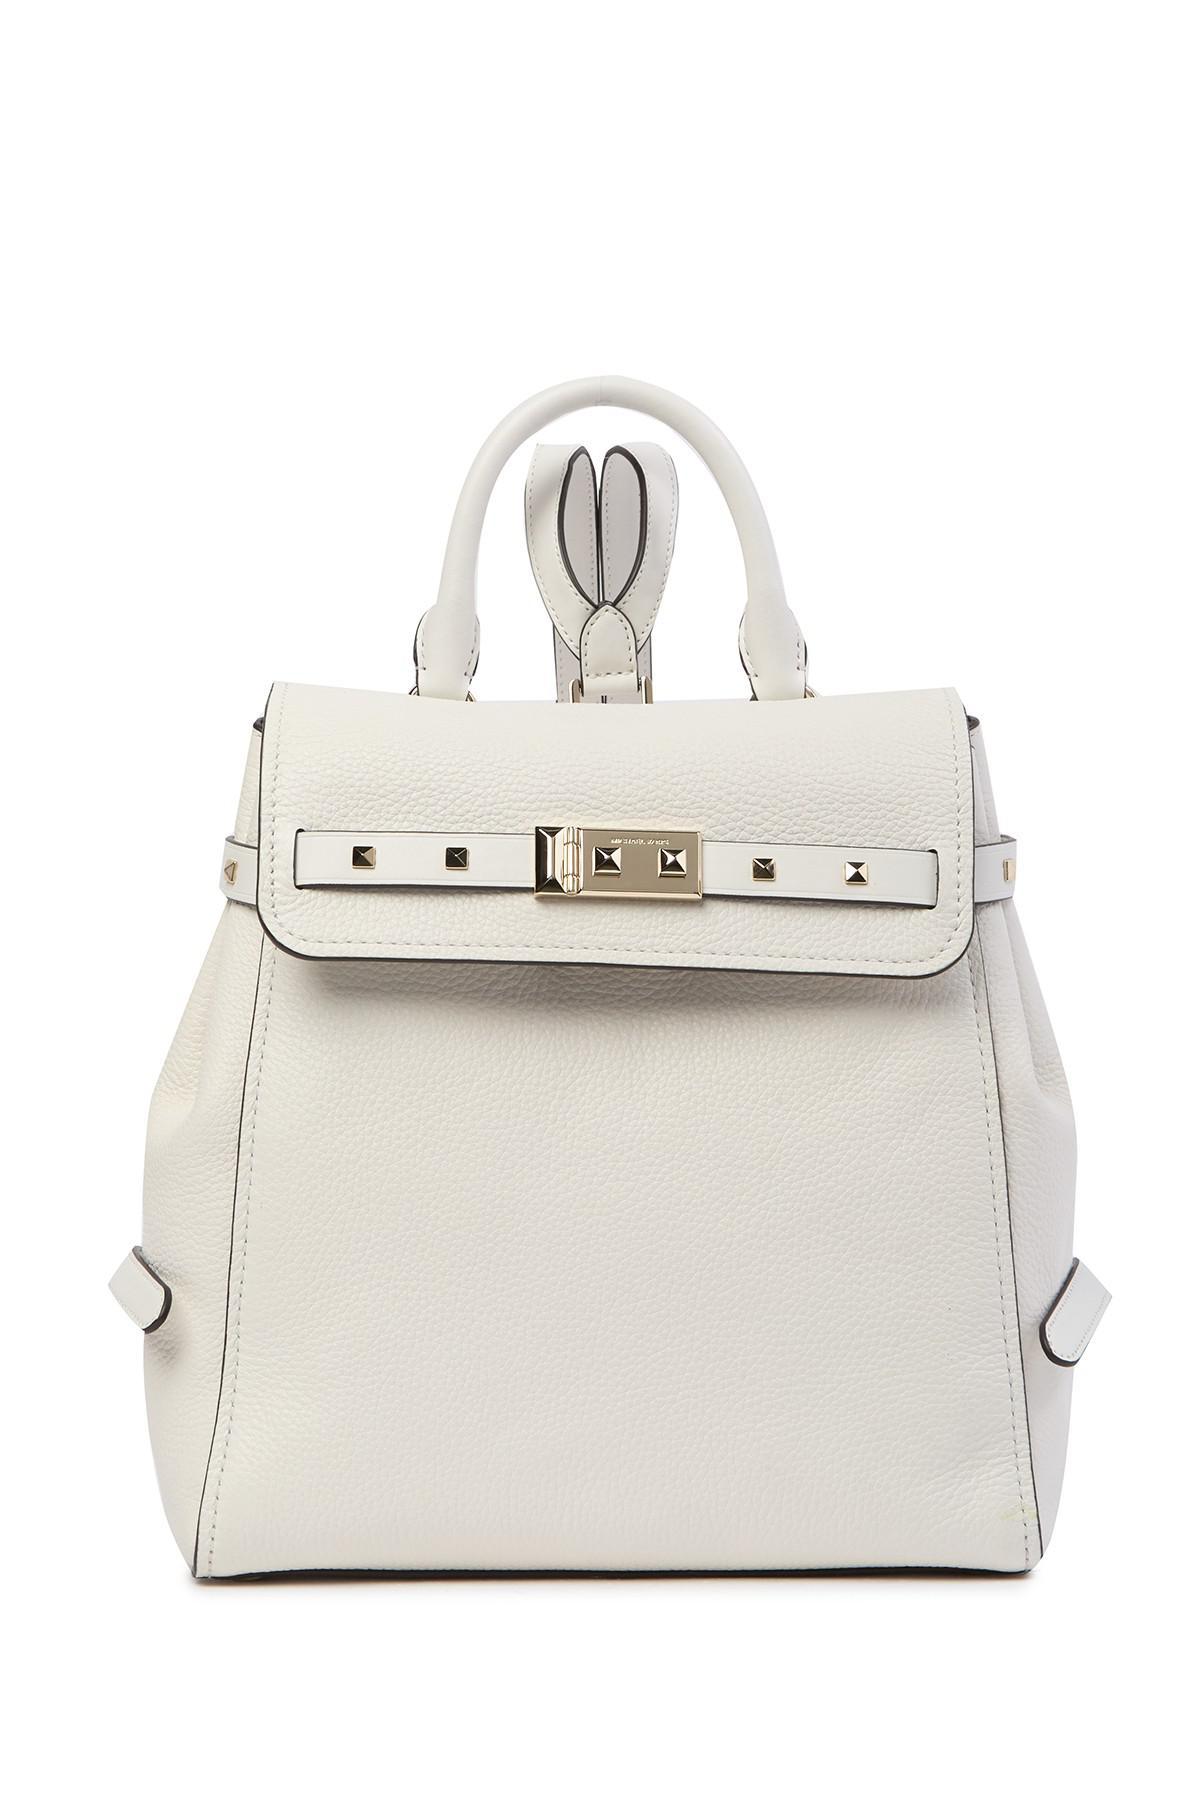 9e659940842b MICHAEL Michael Kors Addison Medium Leather Backpack - Lyst